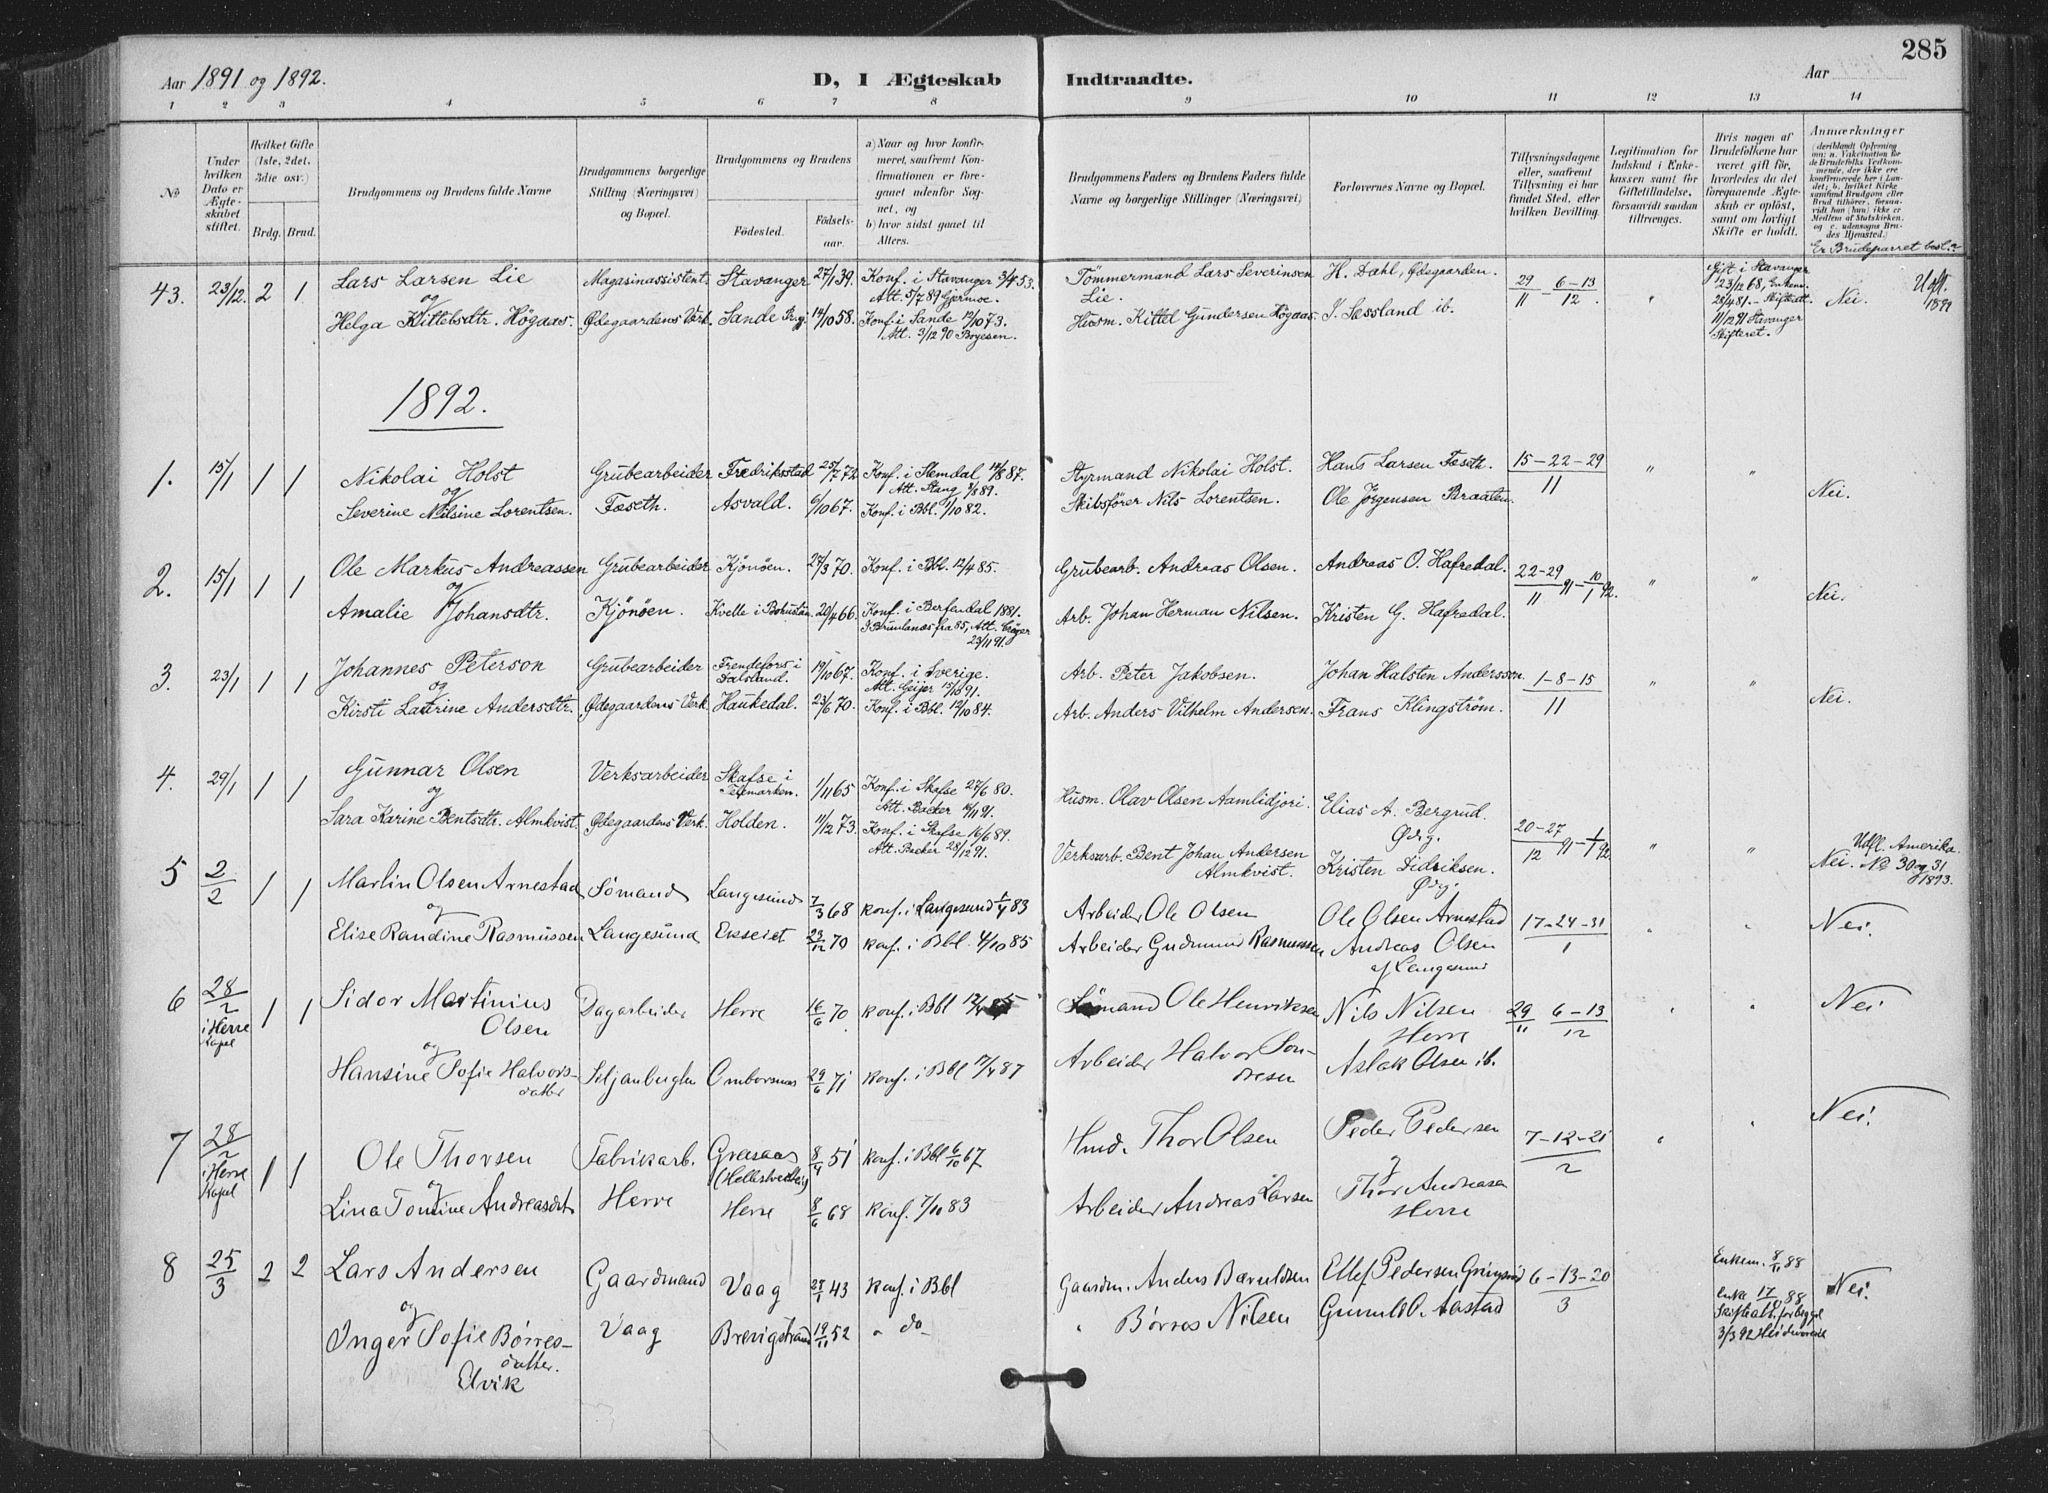 SAKO, Bamble kirkebøker, F/Fa/L0008: Ministerialbok nr. I 8, 1888-1900, s. 285